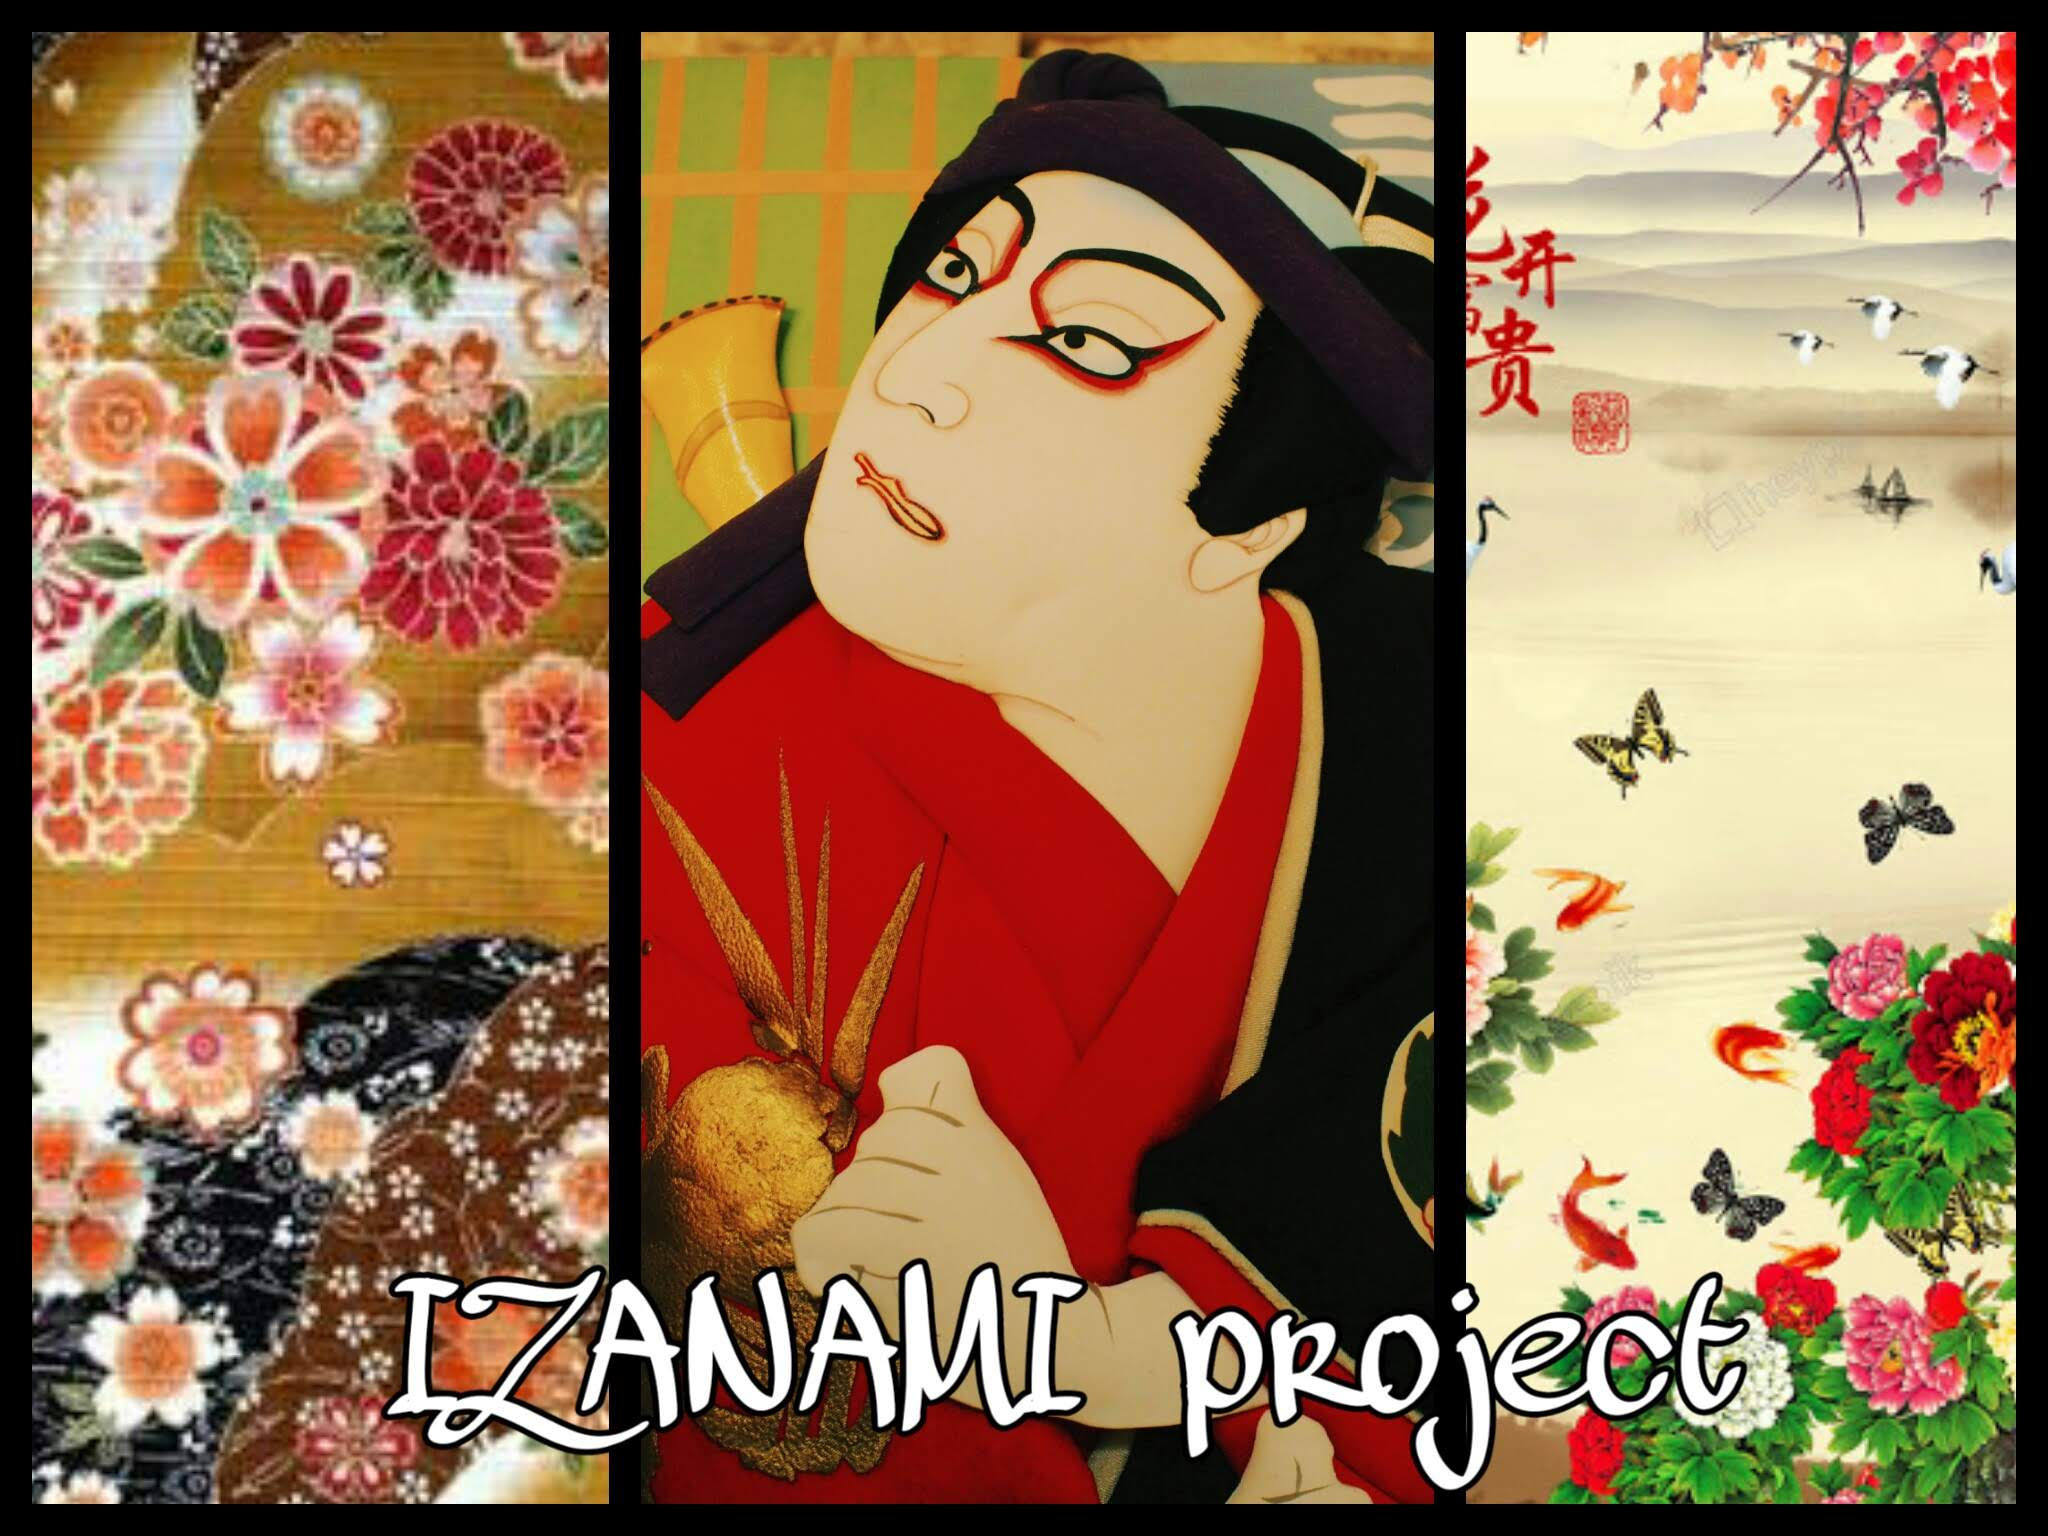 IZANAMI project